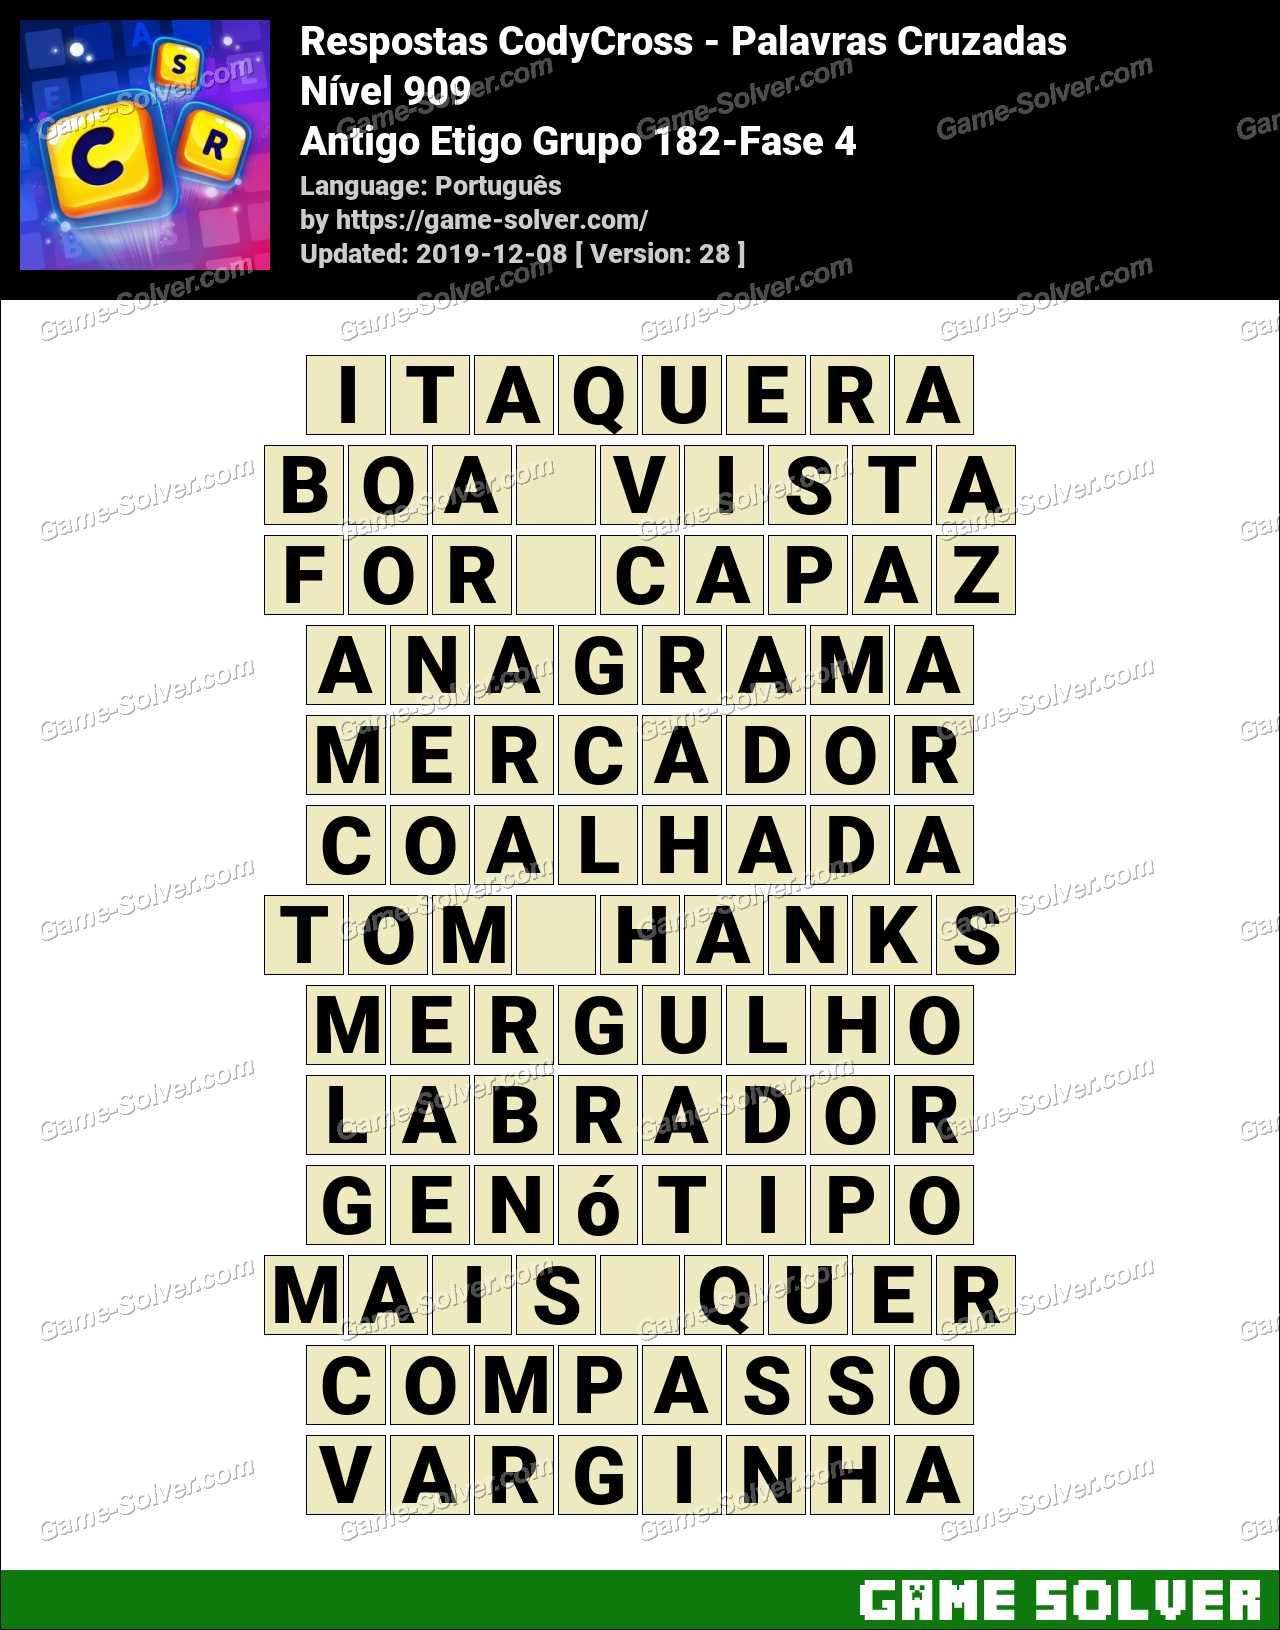 Respostas CodyCross Antigo Etigo Grupo 182-Fase 4